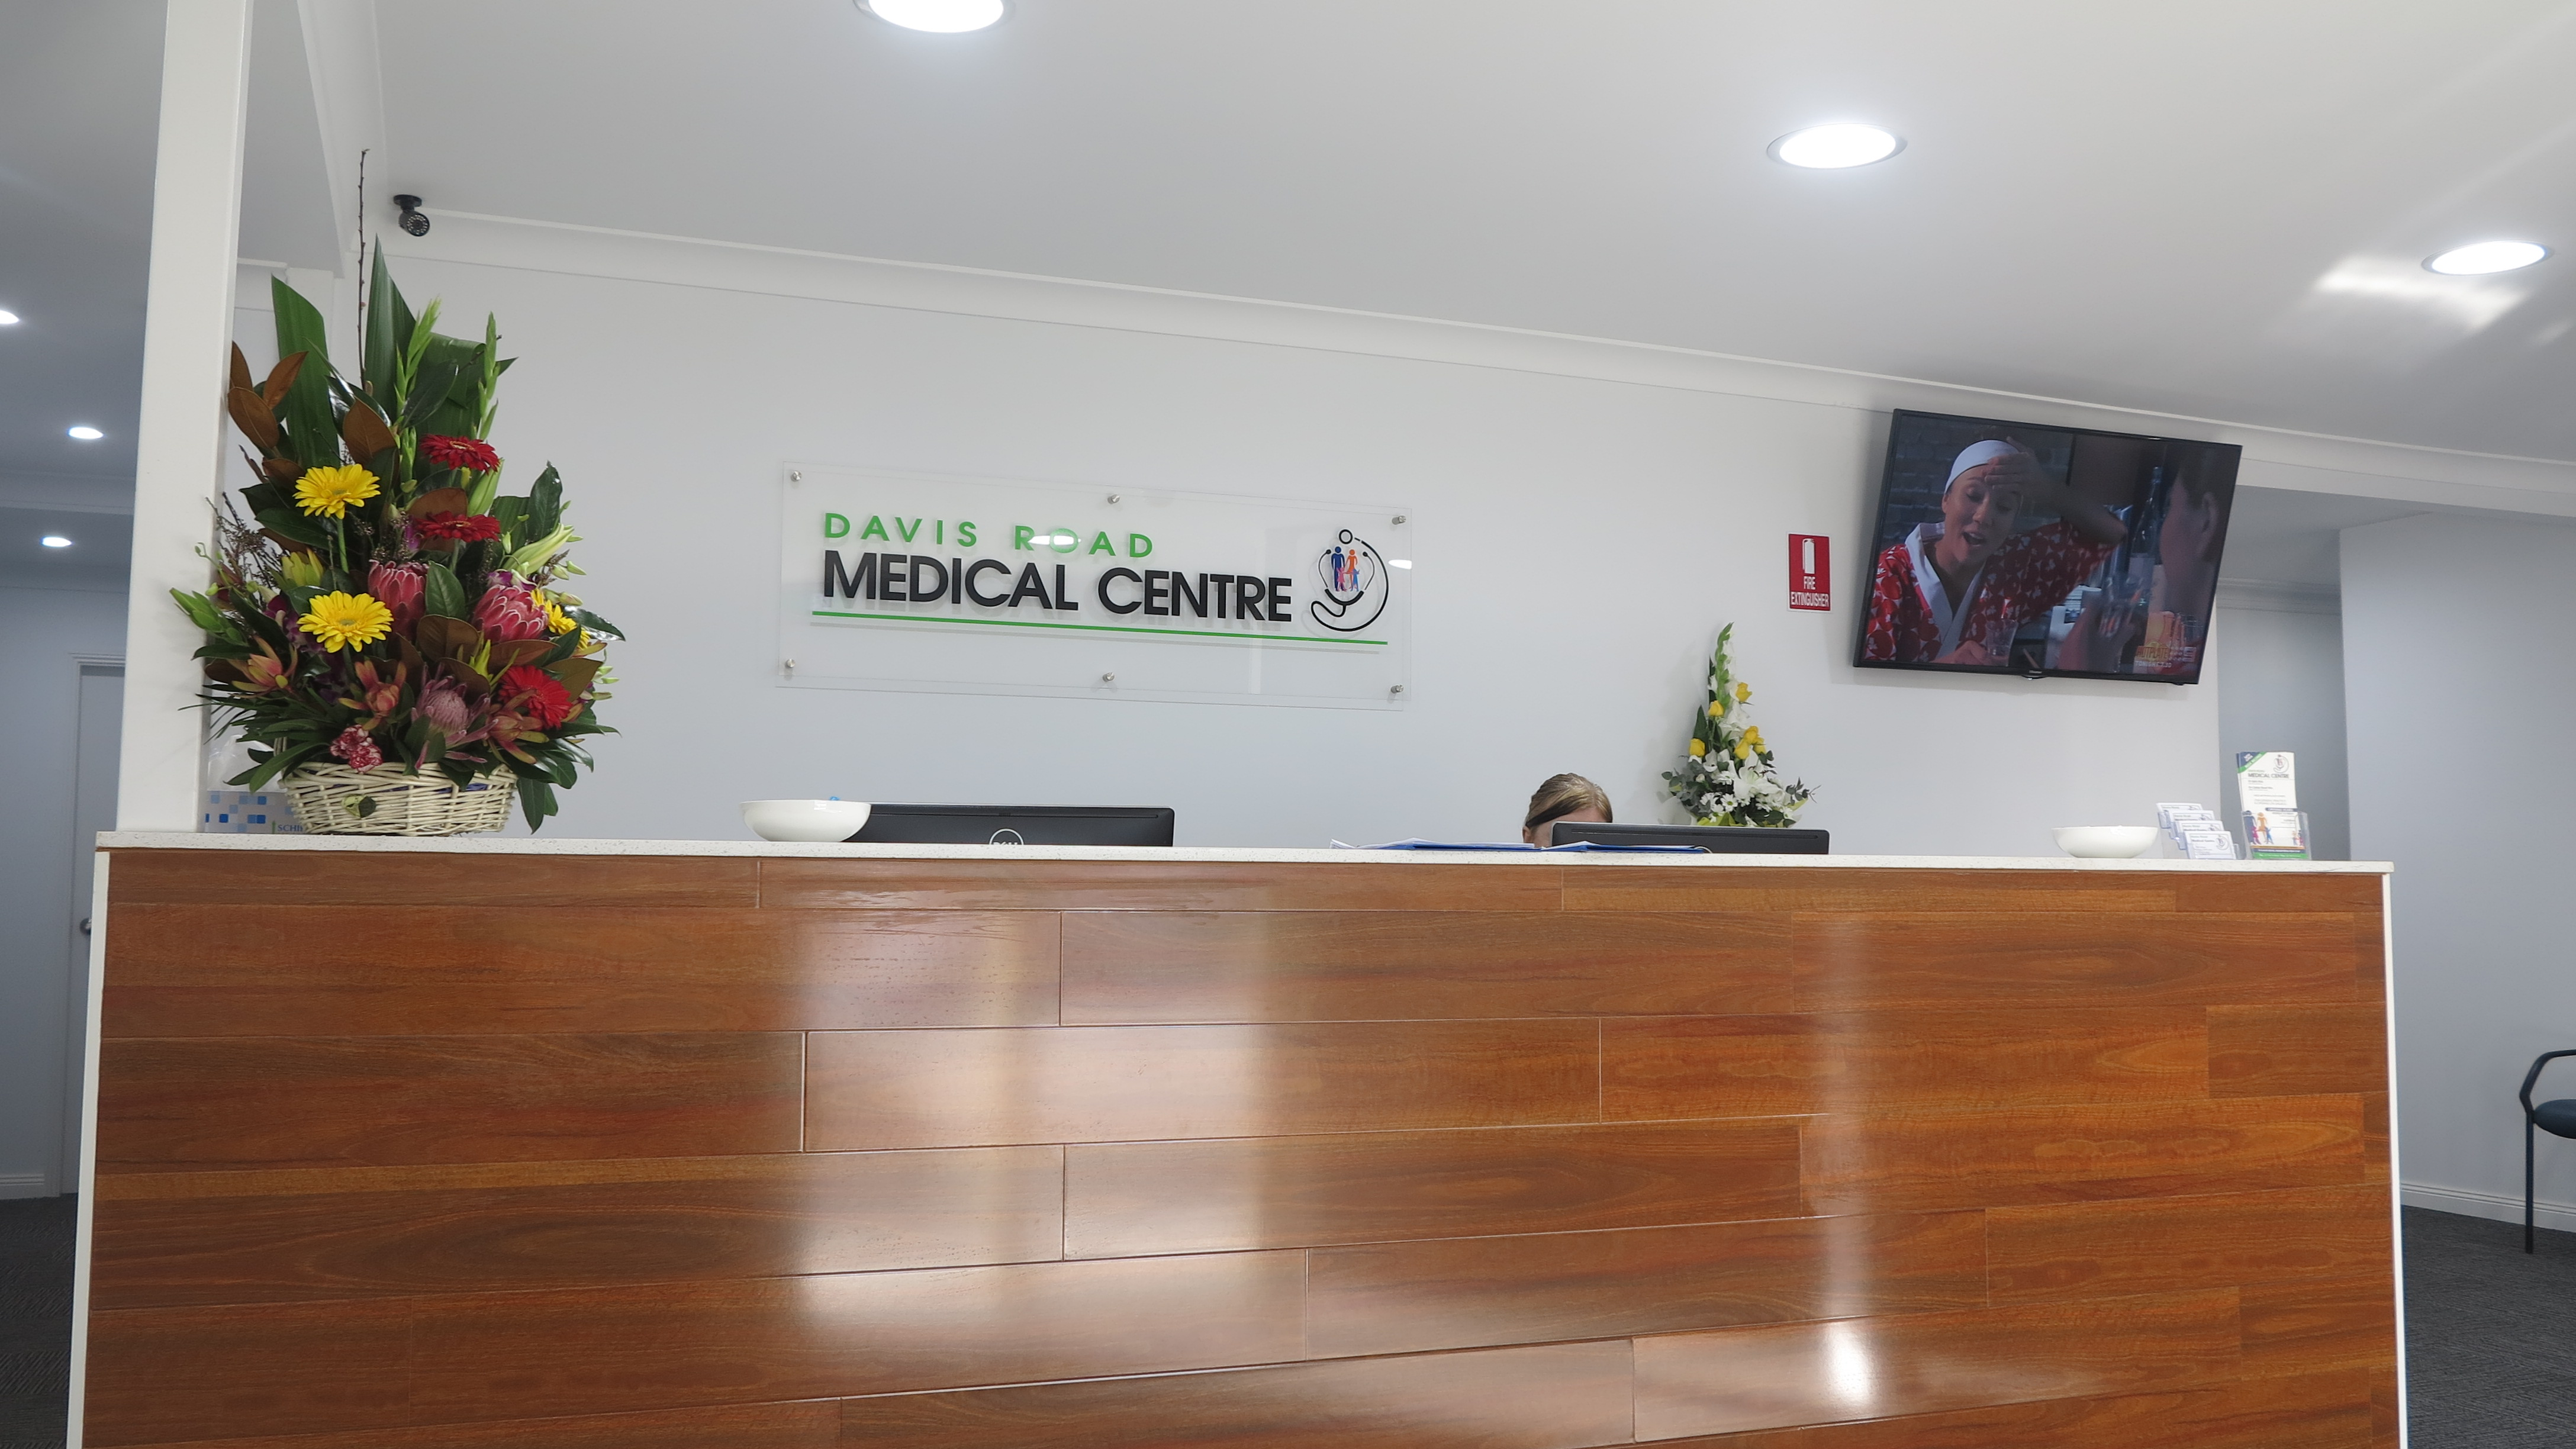 Davis Road Medical Centre